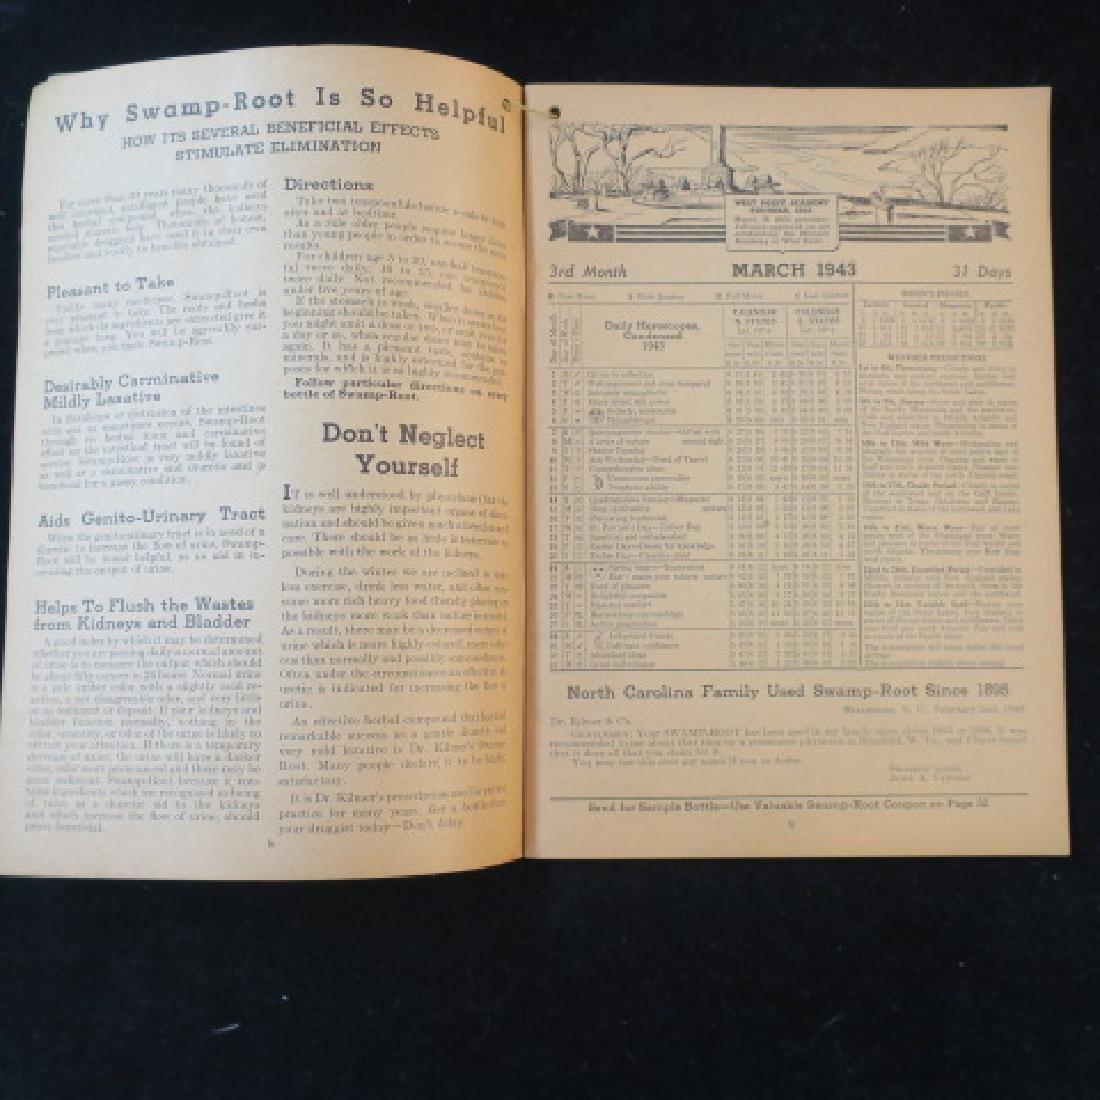 1943 SWAMP-ROOT ALMANAC; Weather, Horoscopes, Dreams: - 2